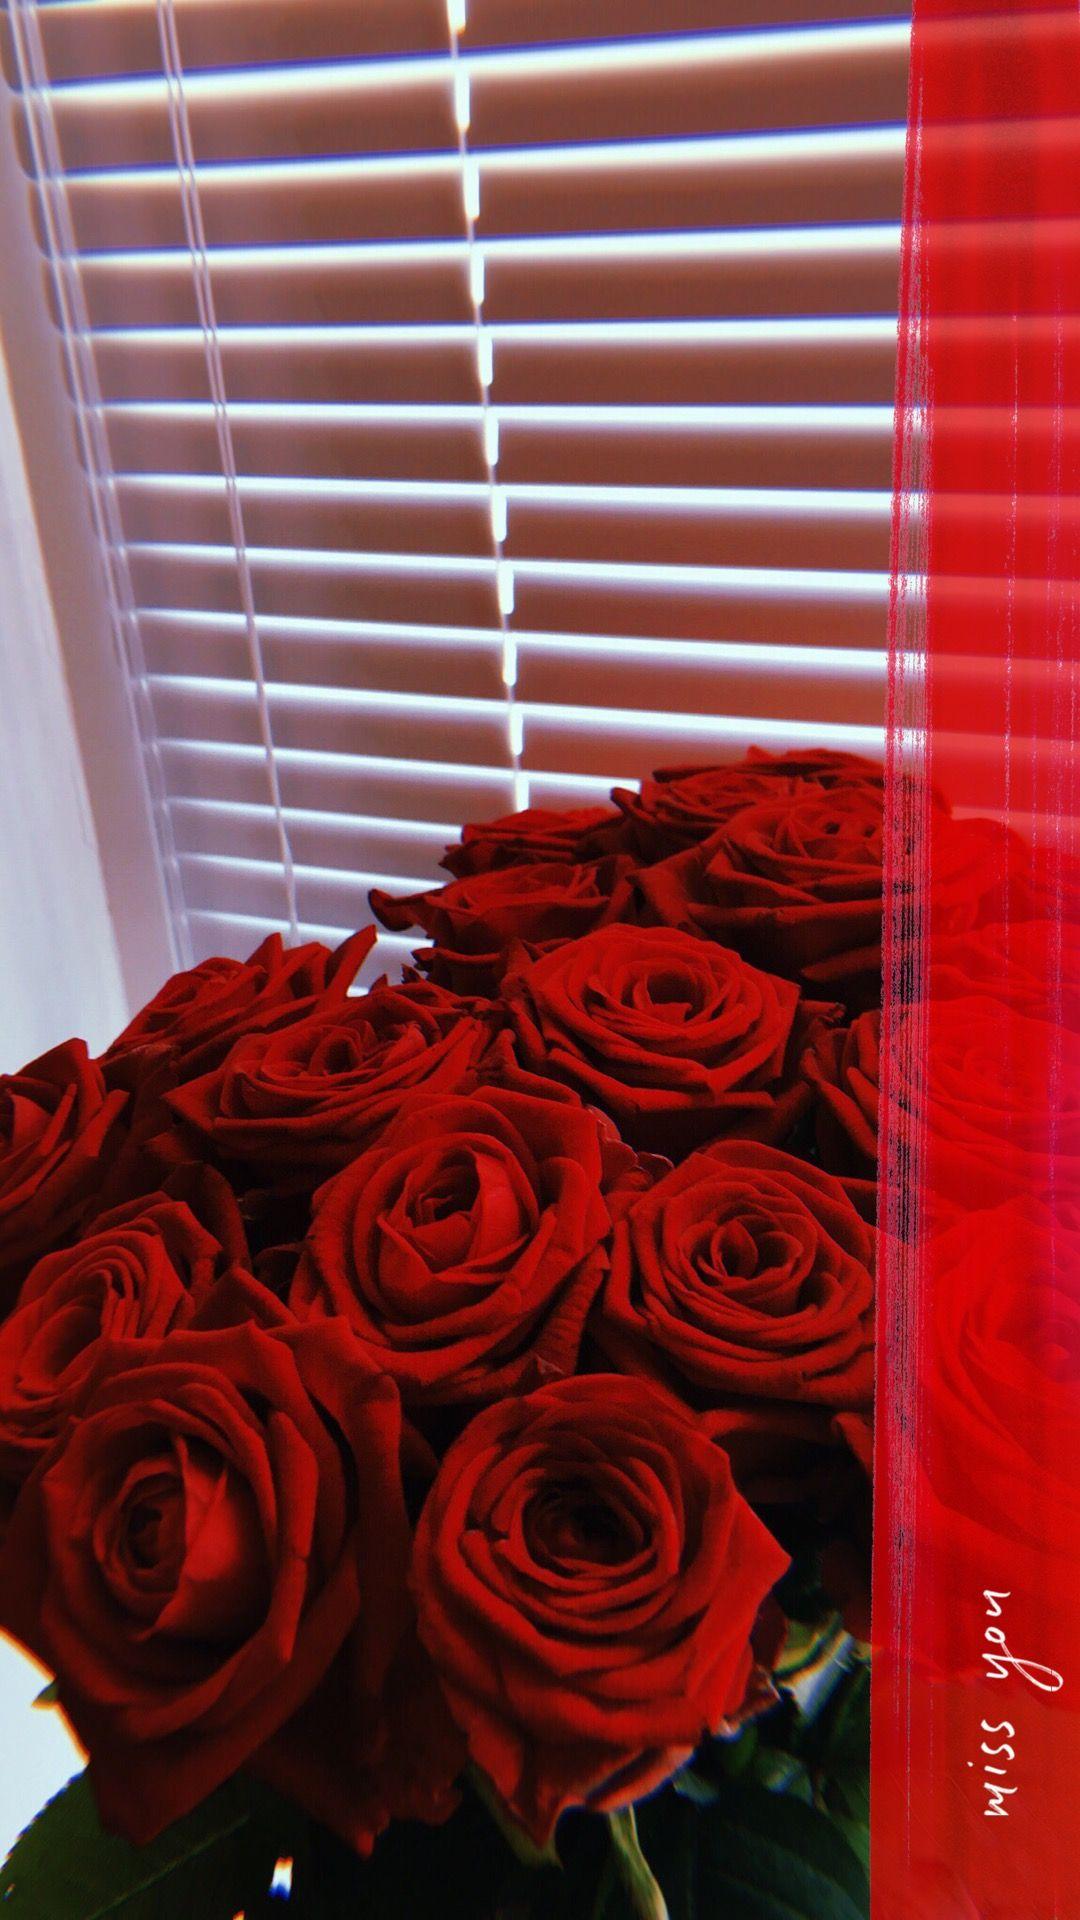 Pin By Majda Metrouh On Cvety Flower Phone Wallpaper Rose Wallpaper Flower Aesthetic